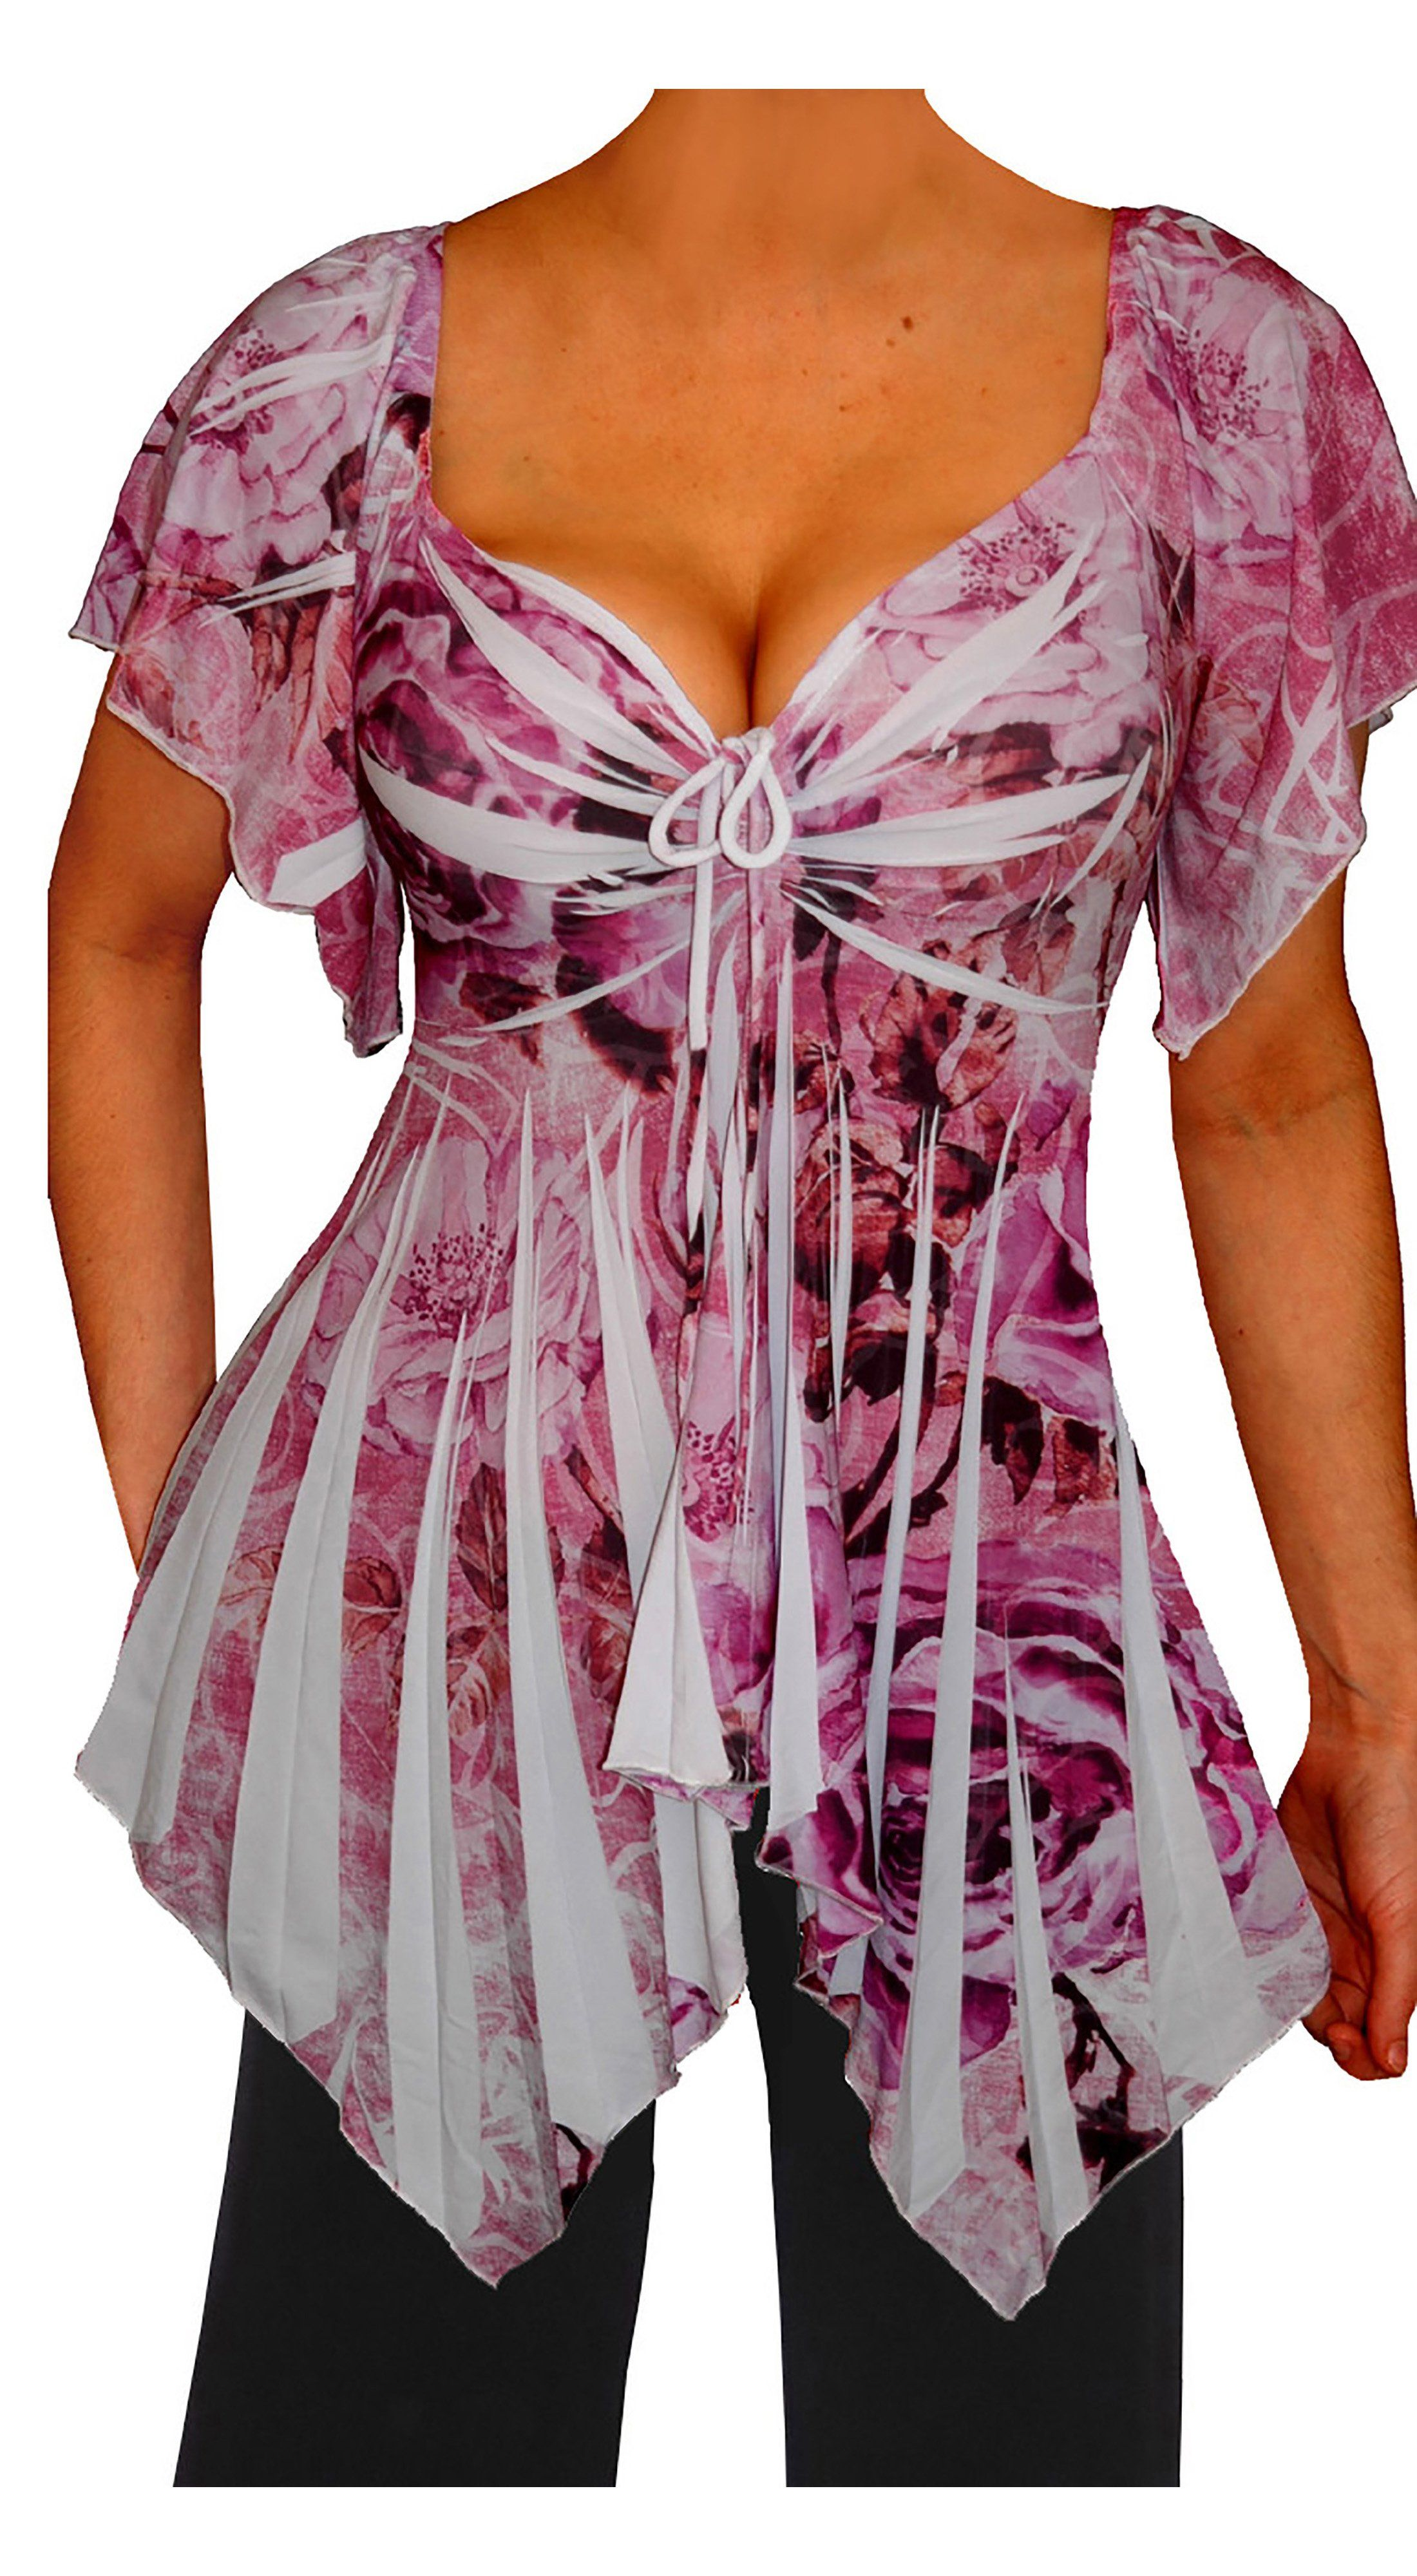 79eb35c333c8 Funfash Plus Size Pink White Empire Waist Slimming Womens Top Shirt